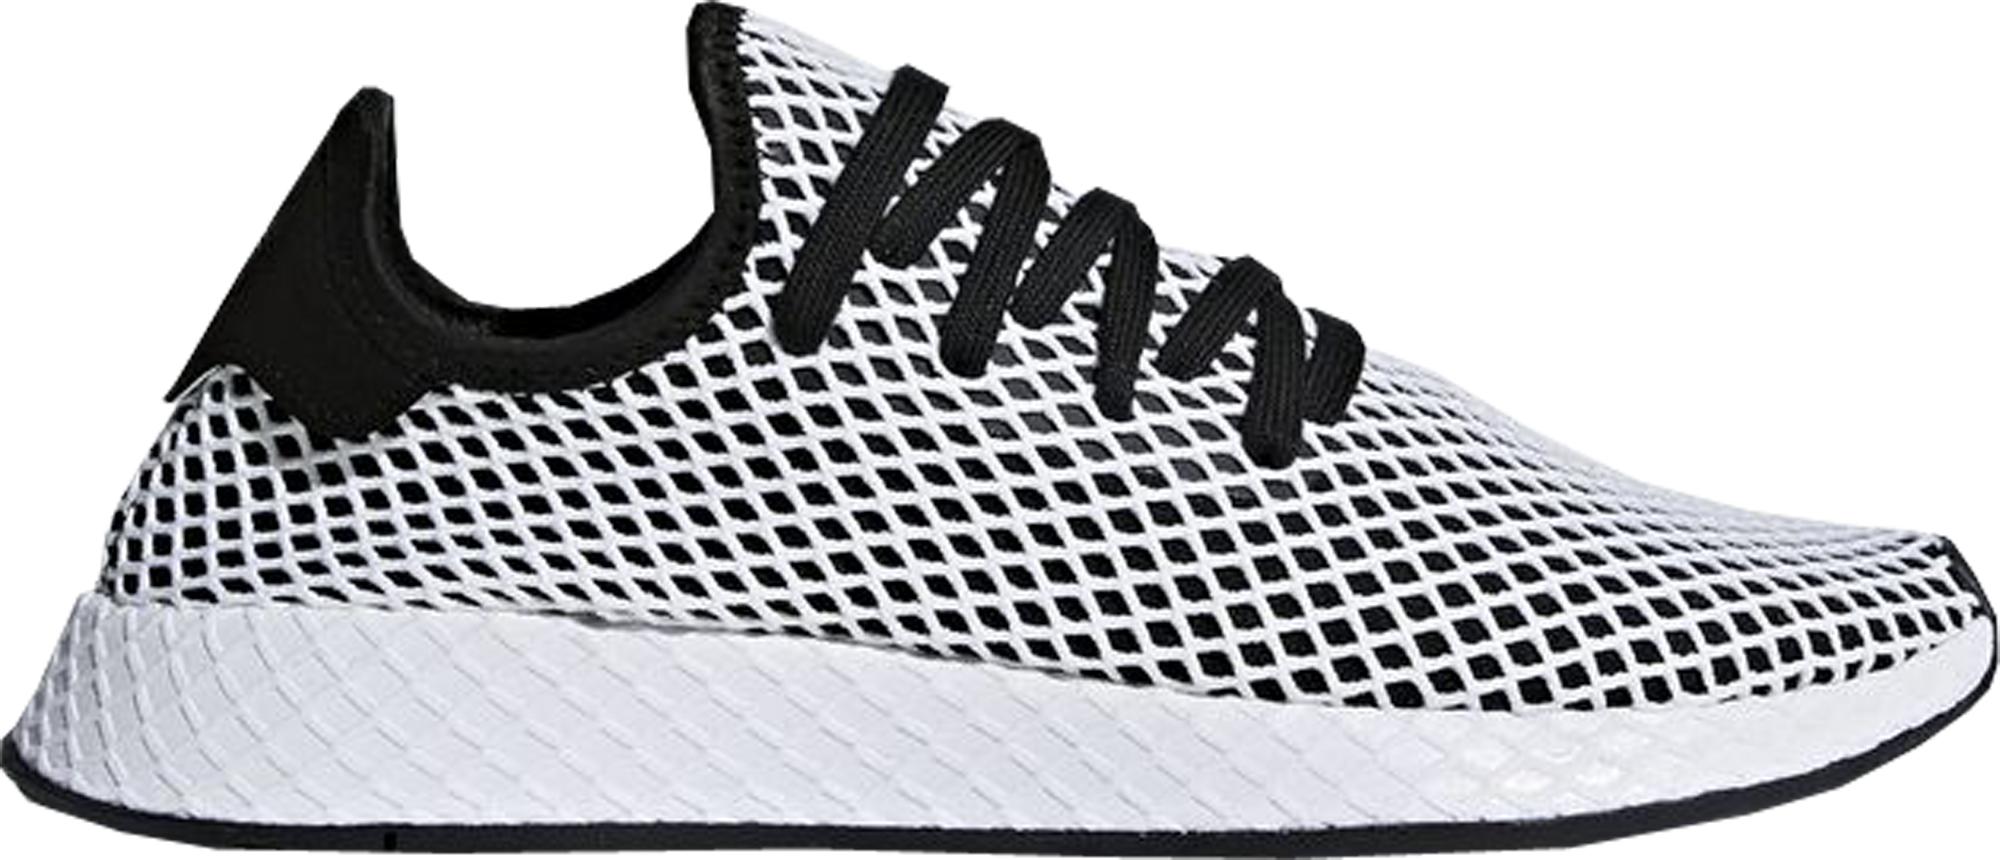 adidas Deerupt Black White